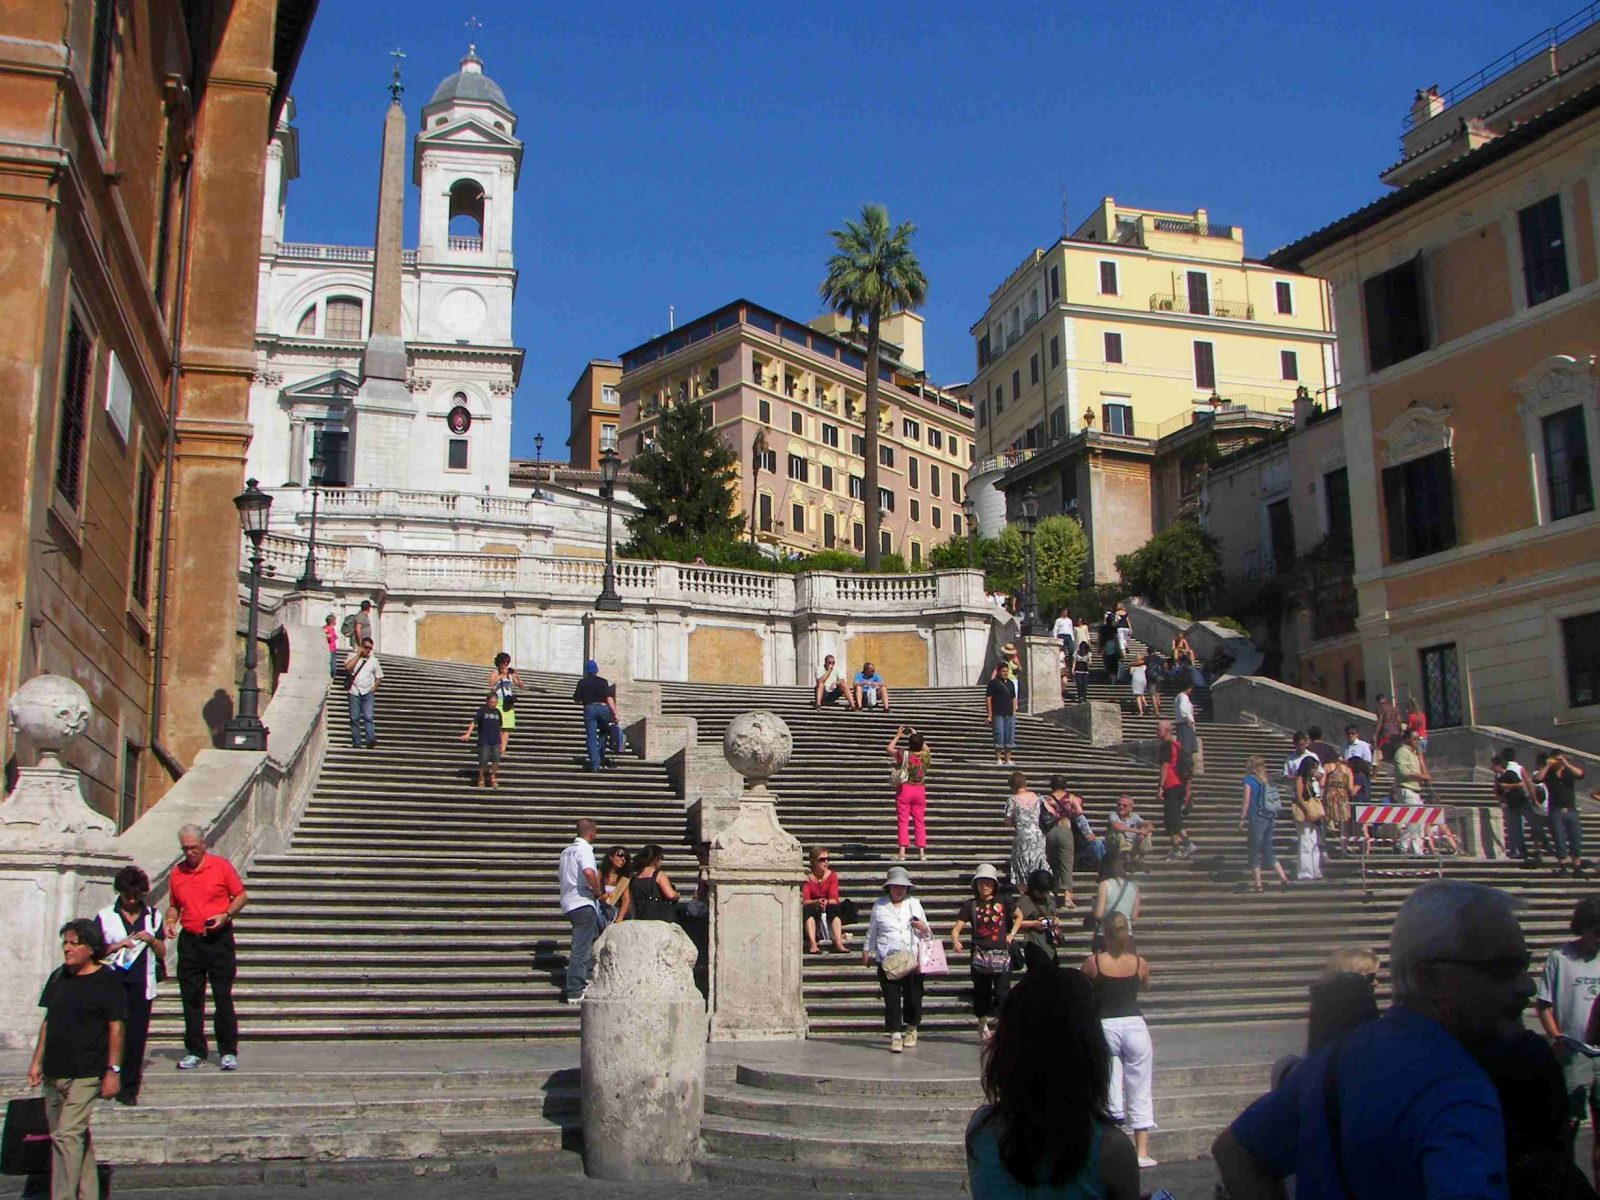 Filerom Spanische Treppe  Wikimedia Commons von Webcam Rom Spanische Treppe Photo